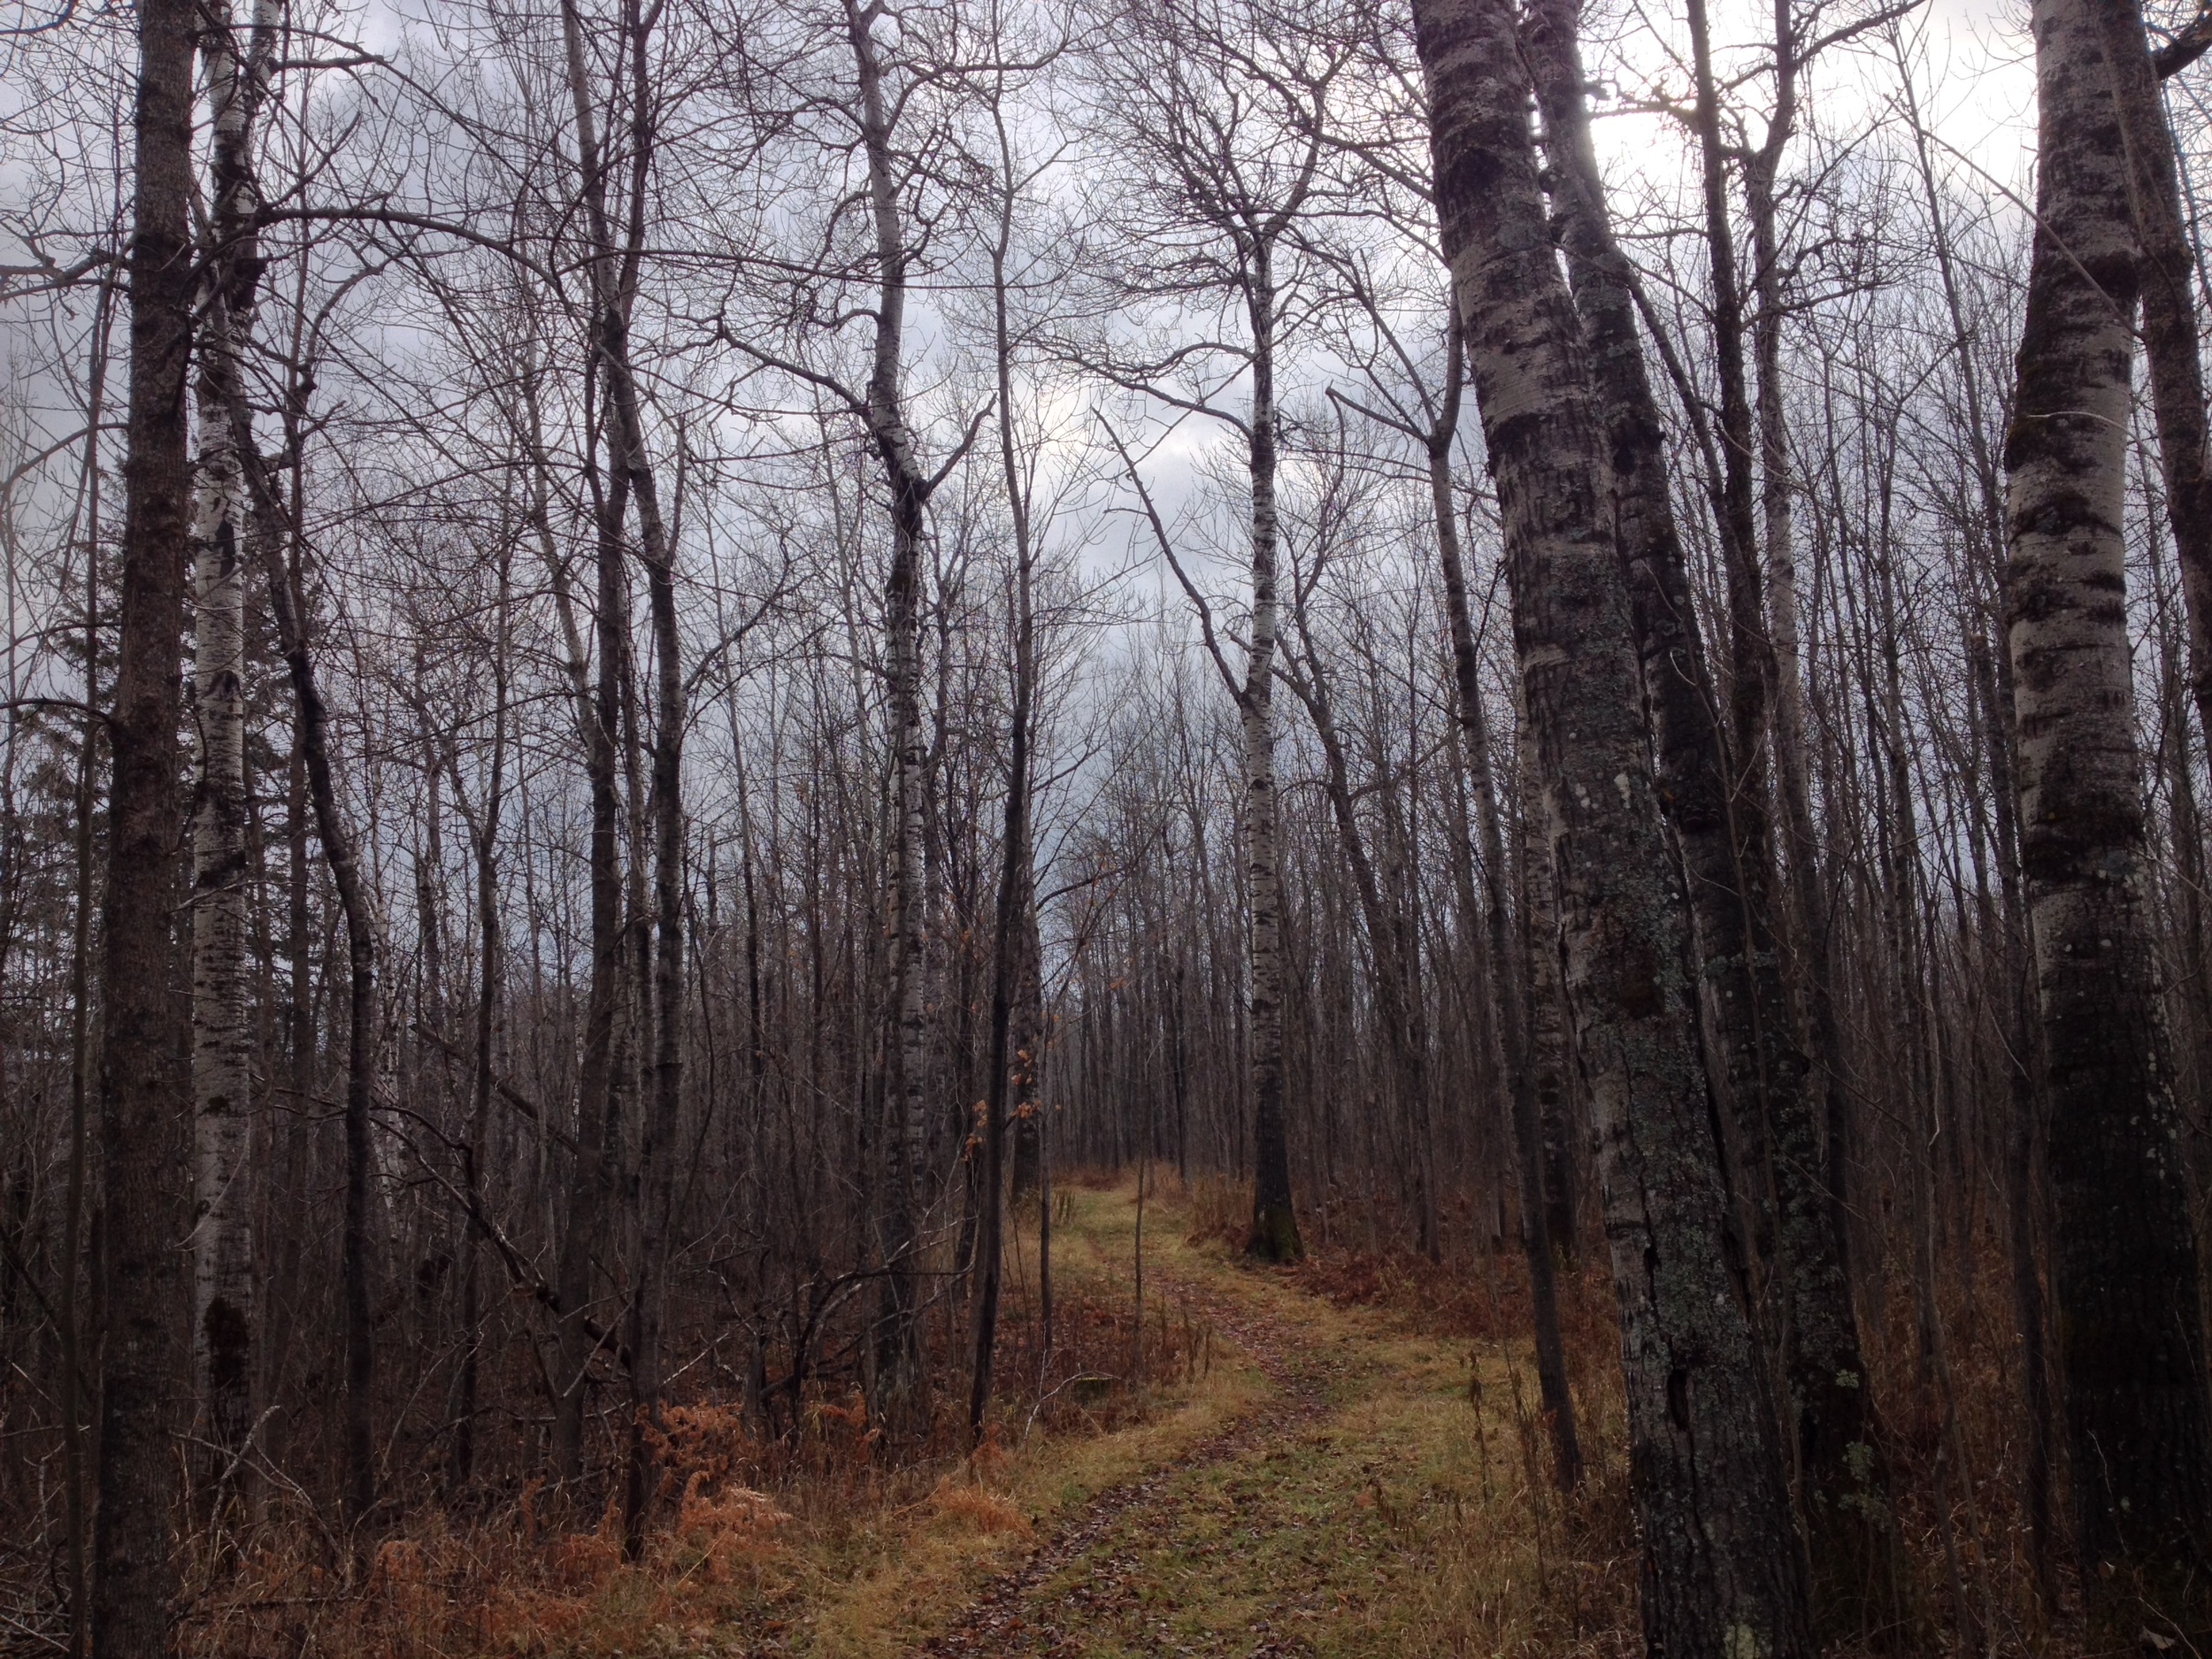 Winding Trails